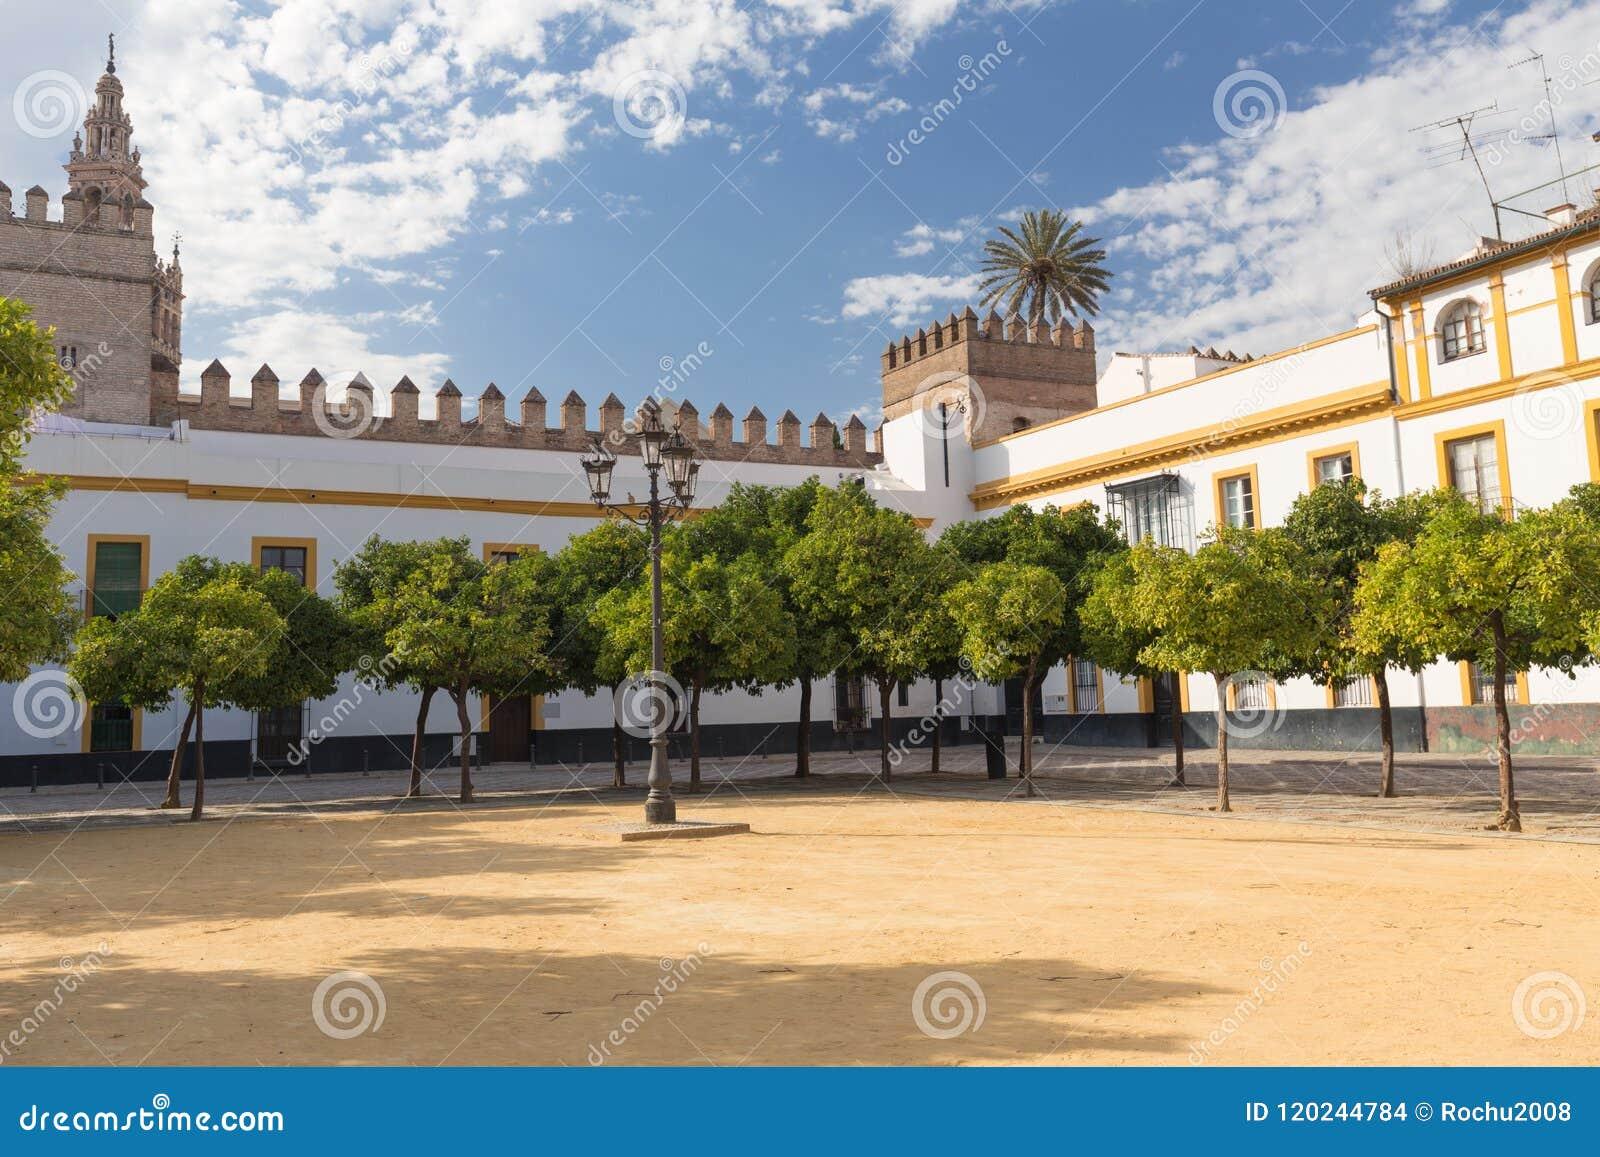 Seville Spain Architecture Barrio Santa Cruz District Stock Photo